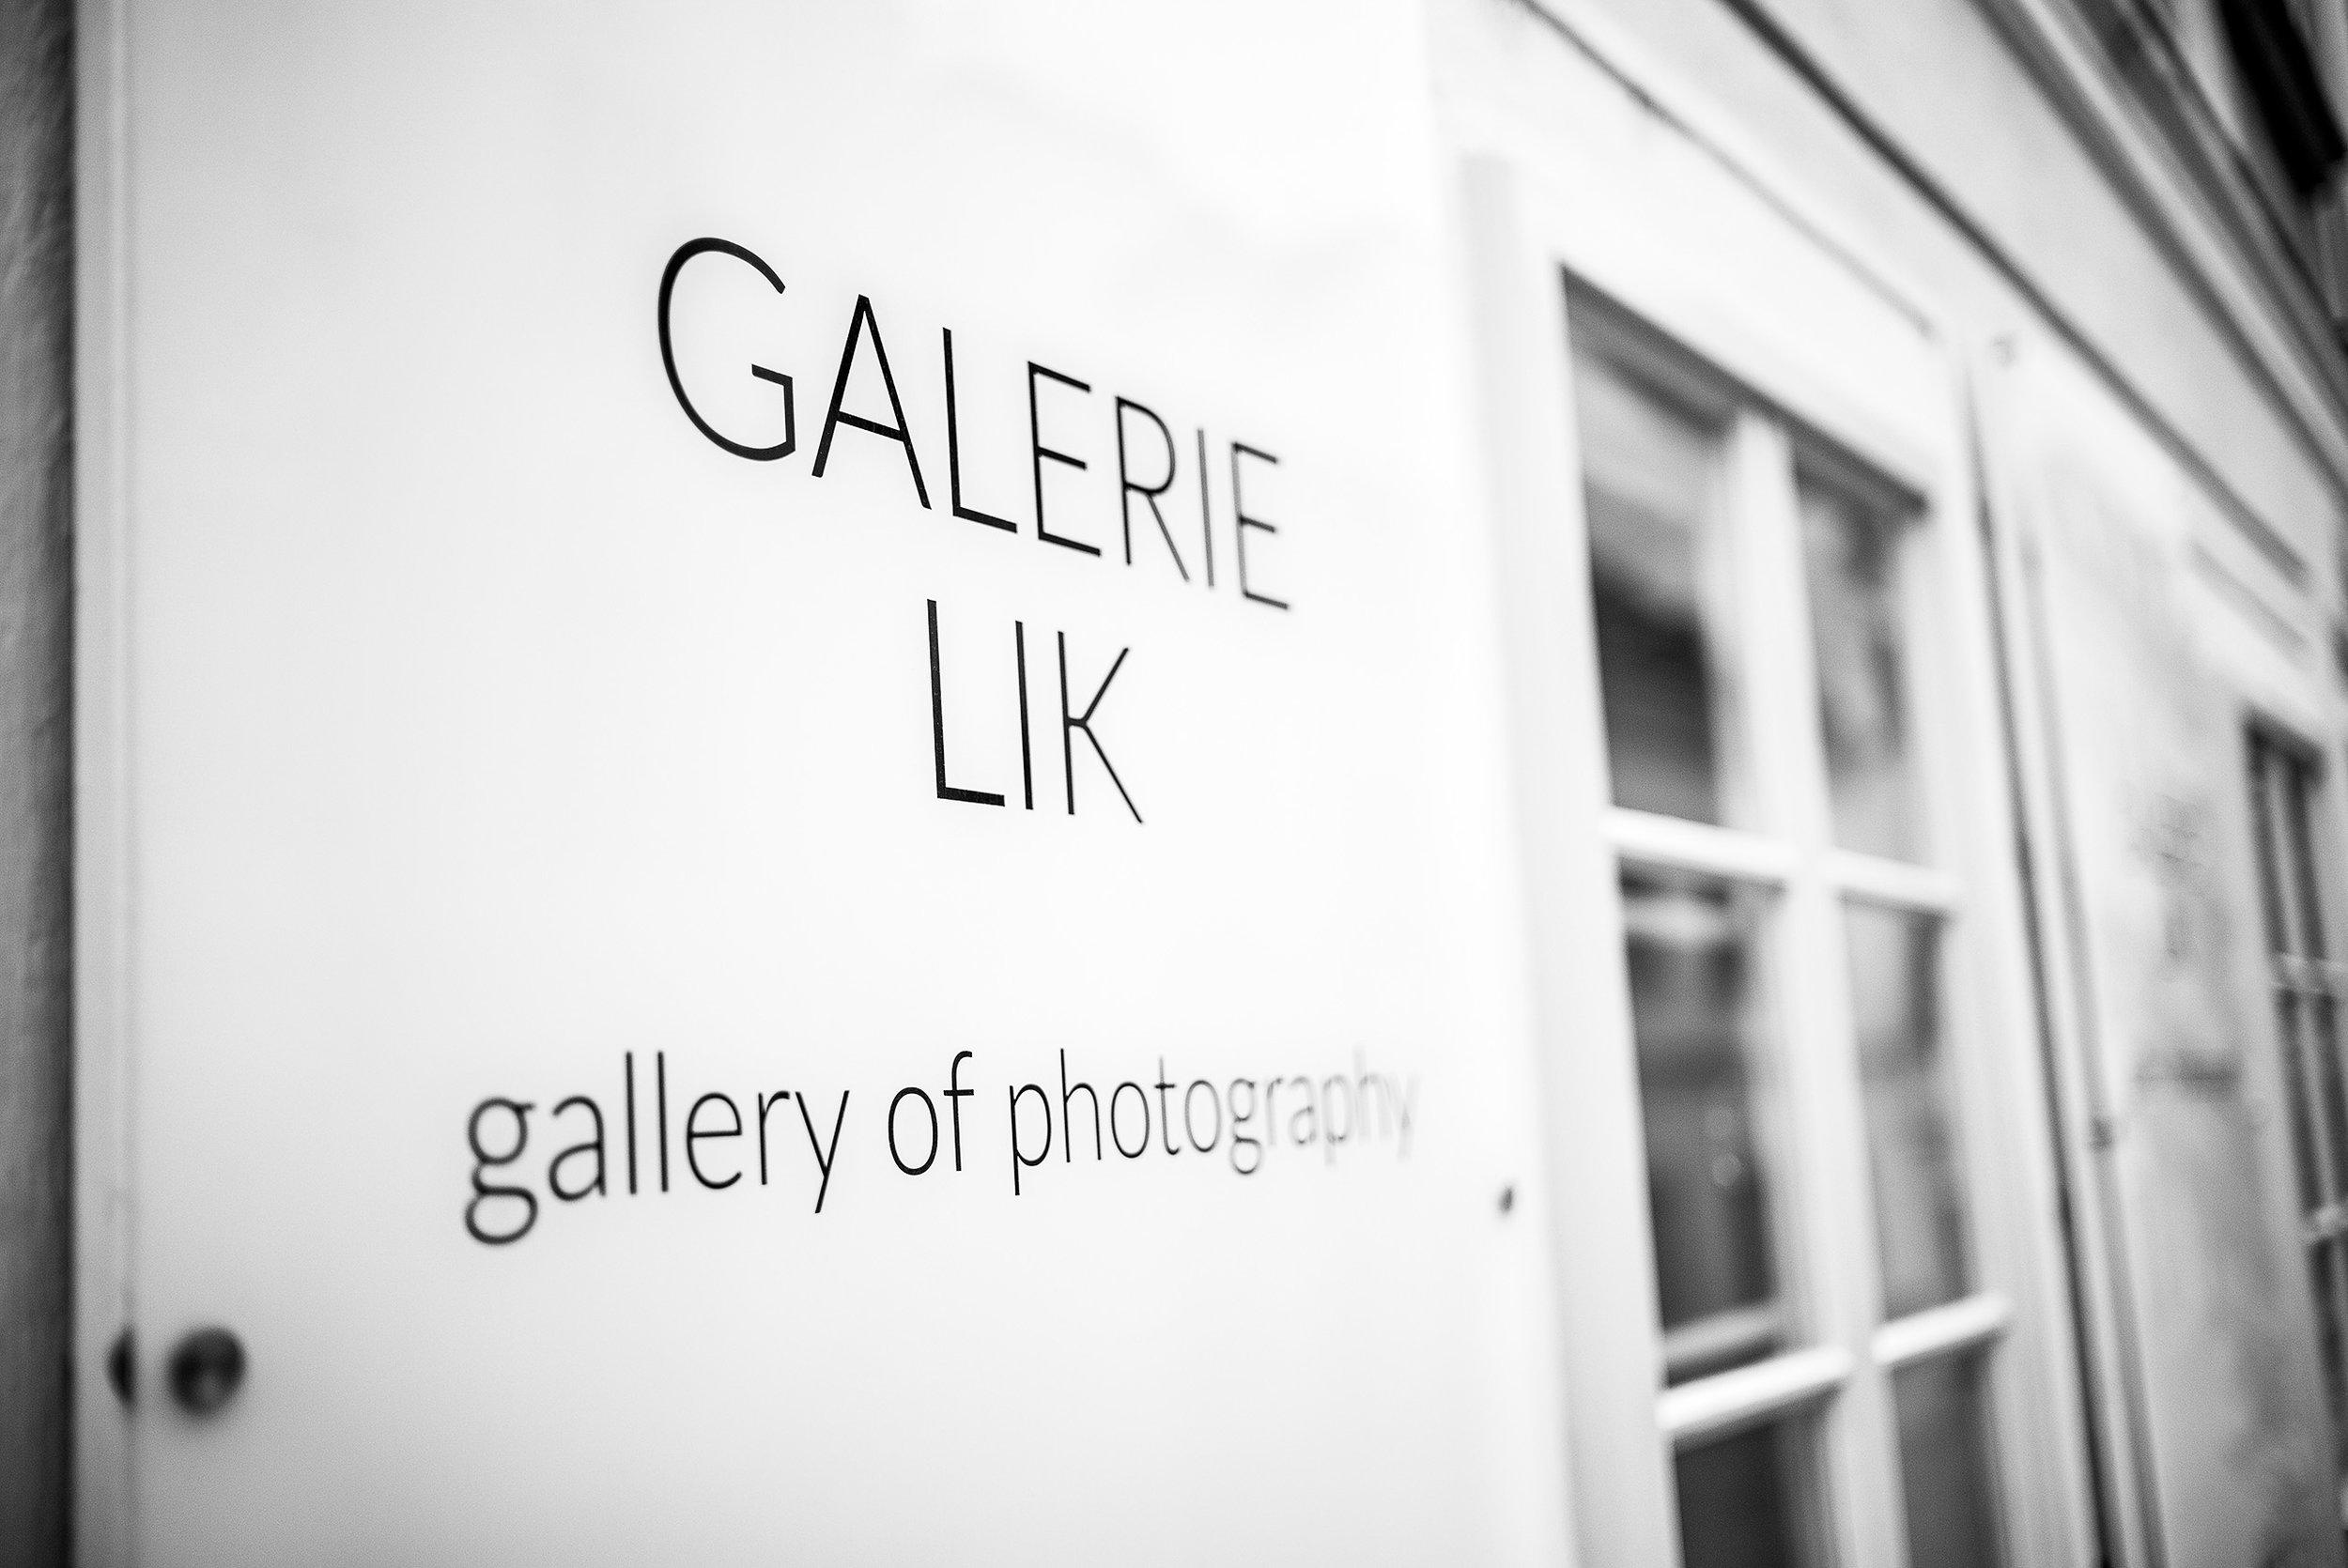 Galerie LIK - Spittelberggasse